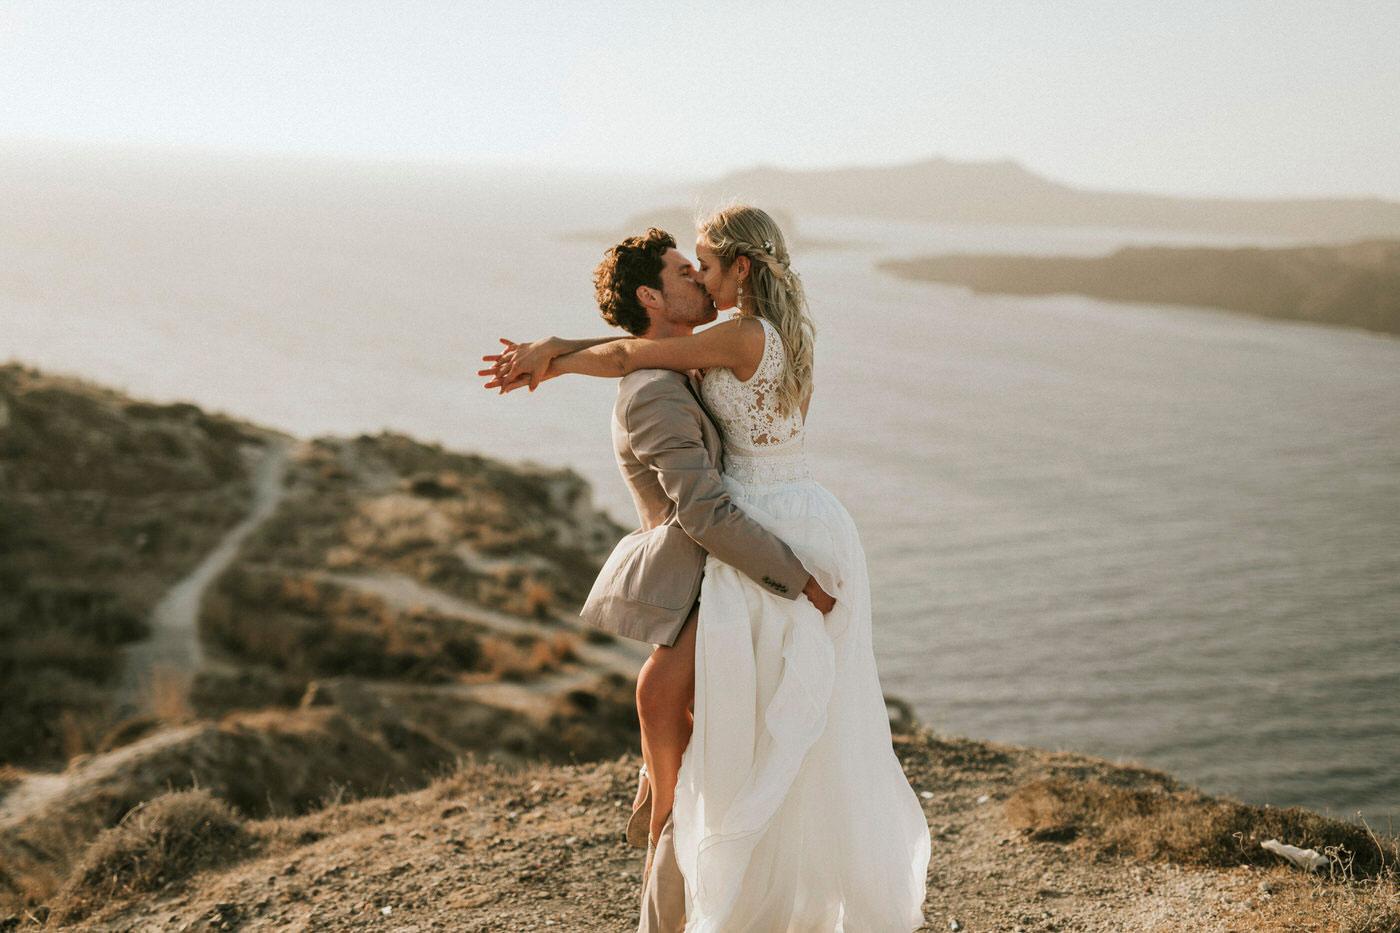 Verena & Thomas's Romantic Santorini Wedding